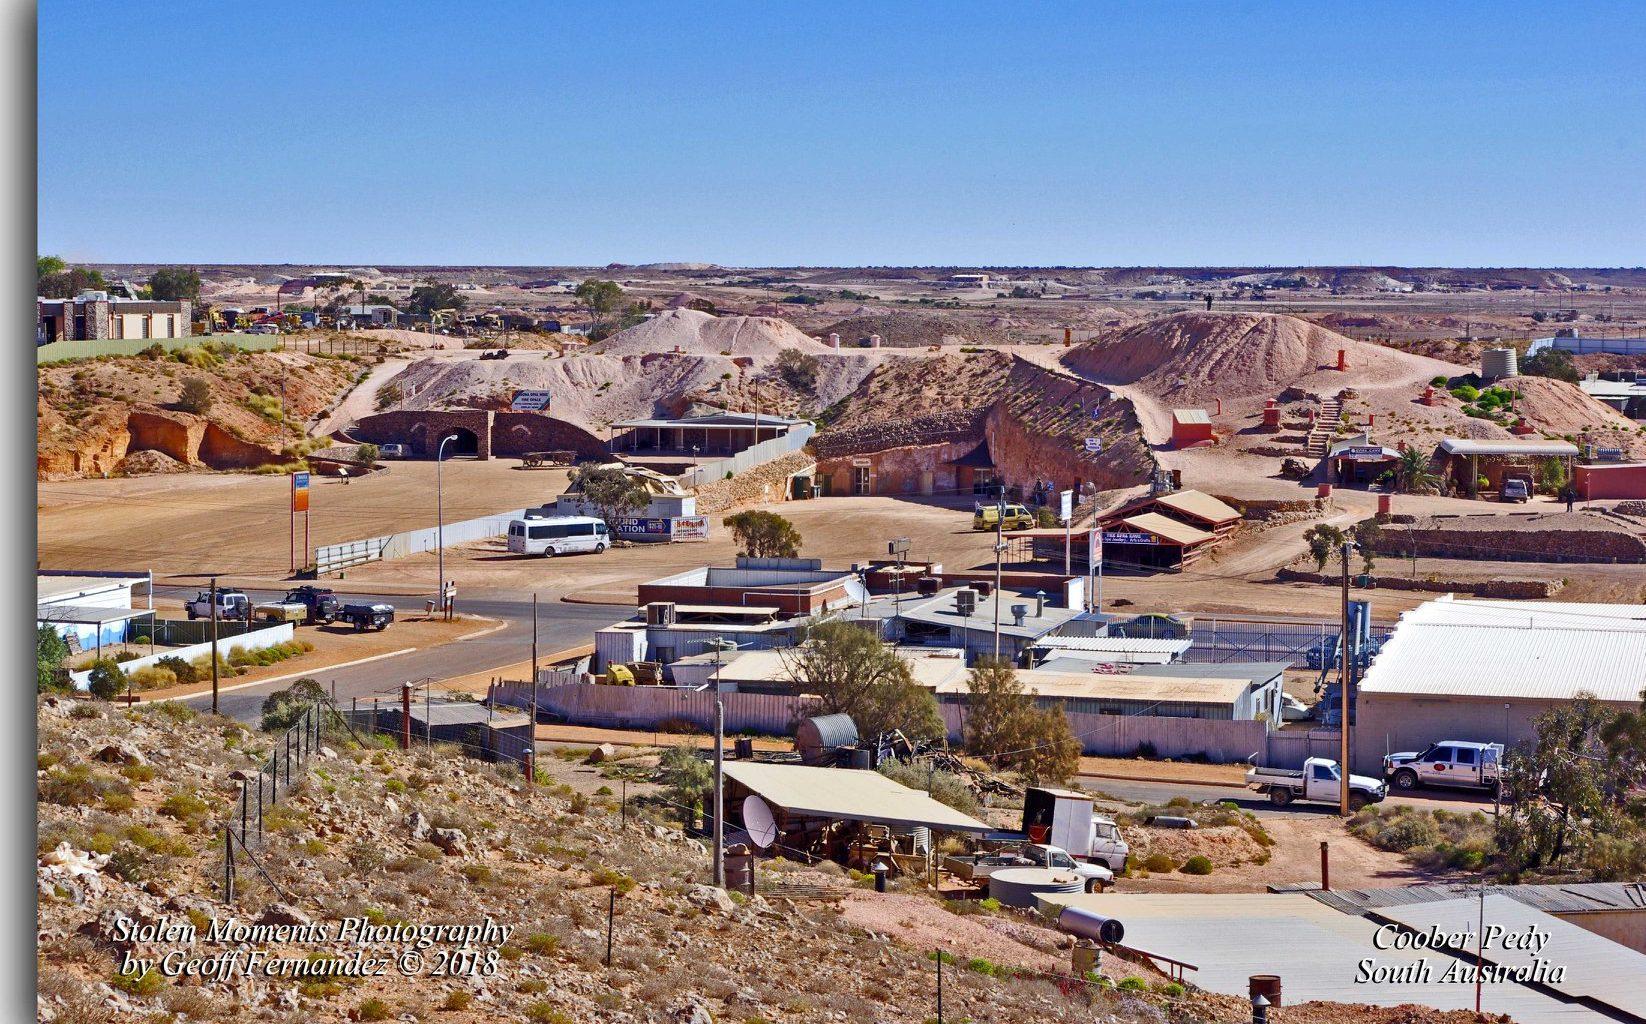 Coober Pedy underground homes - Australian opal